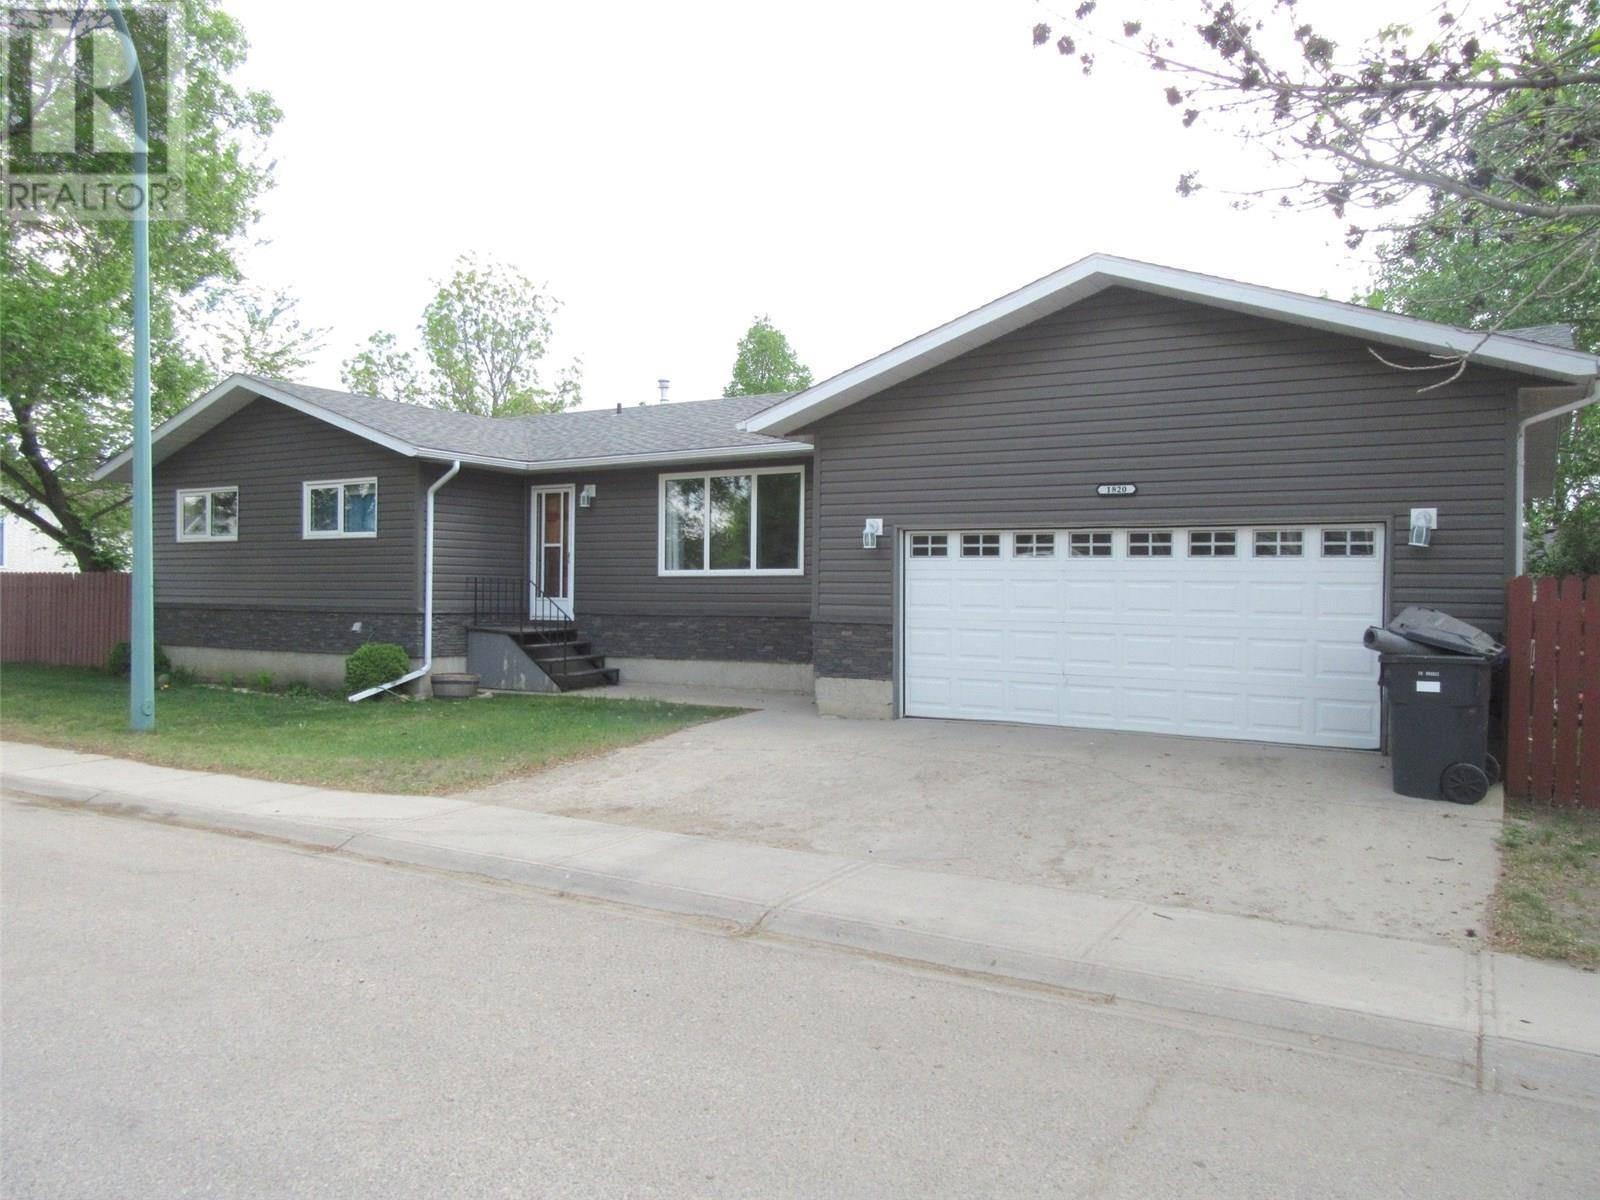 House for sale at 1820 Coteau Ave Weyburn Saskatchewan - MLS: SK775733